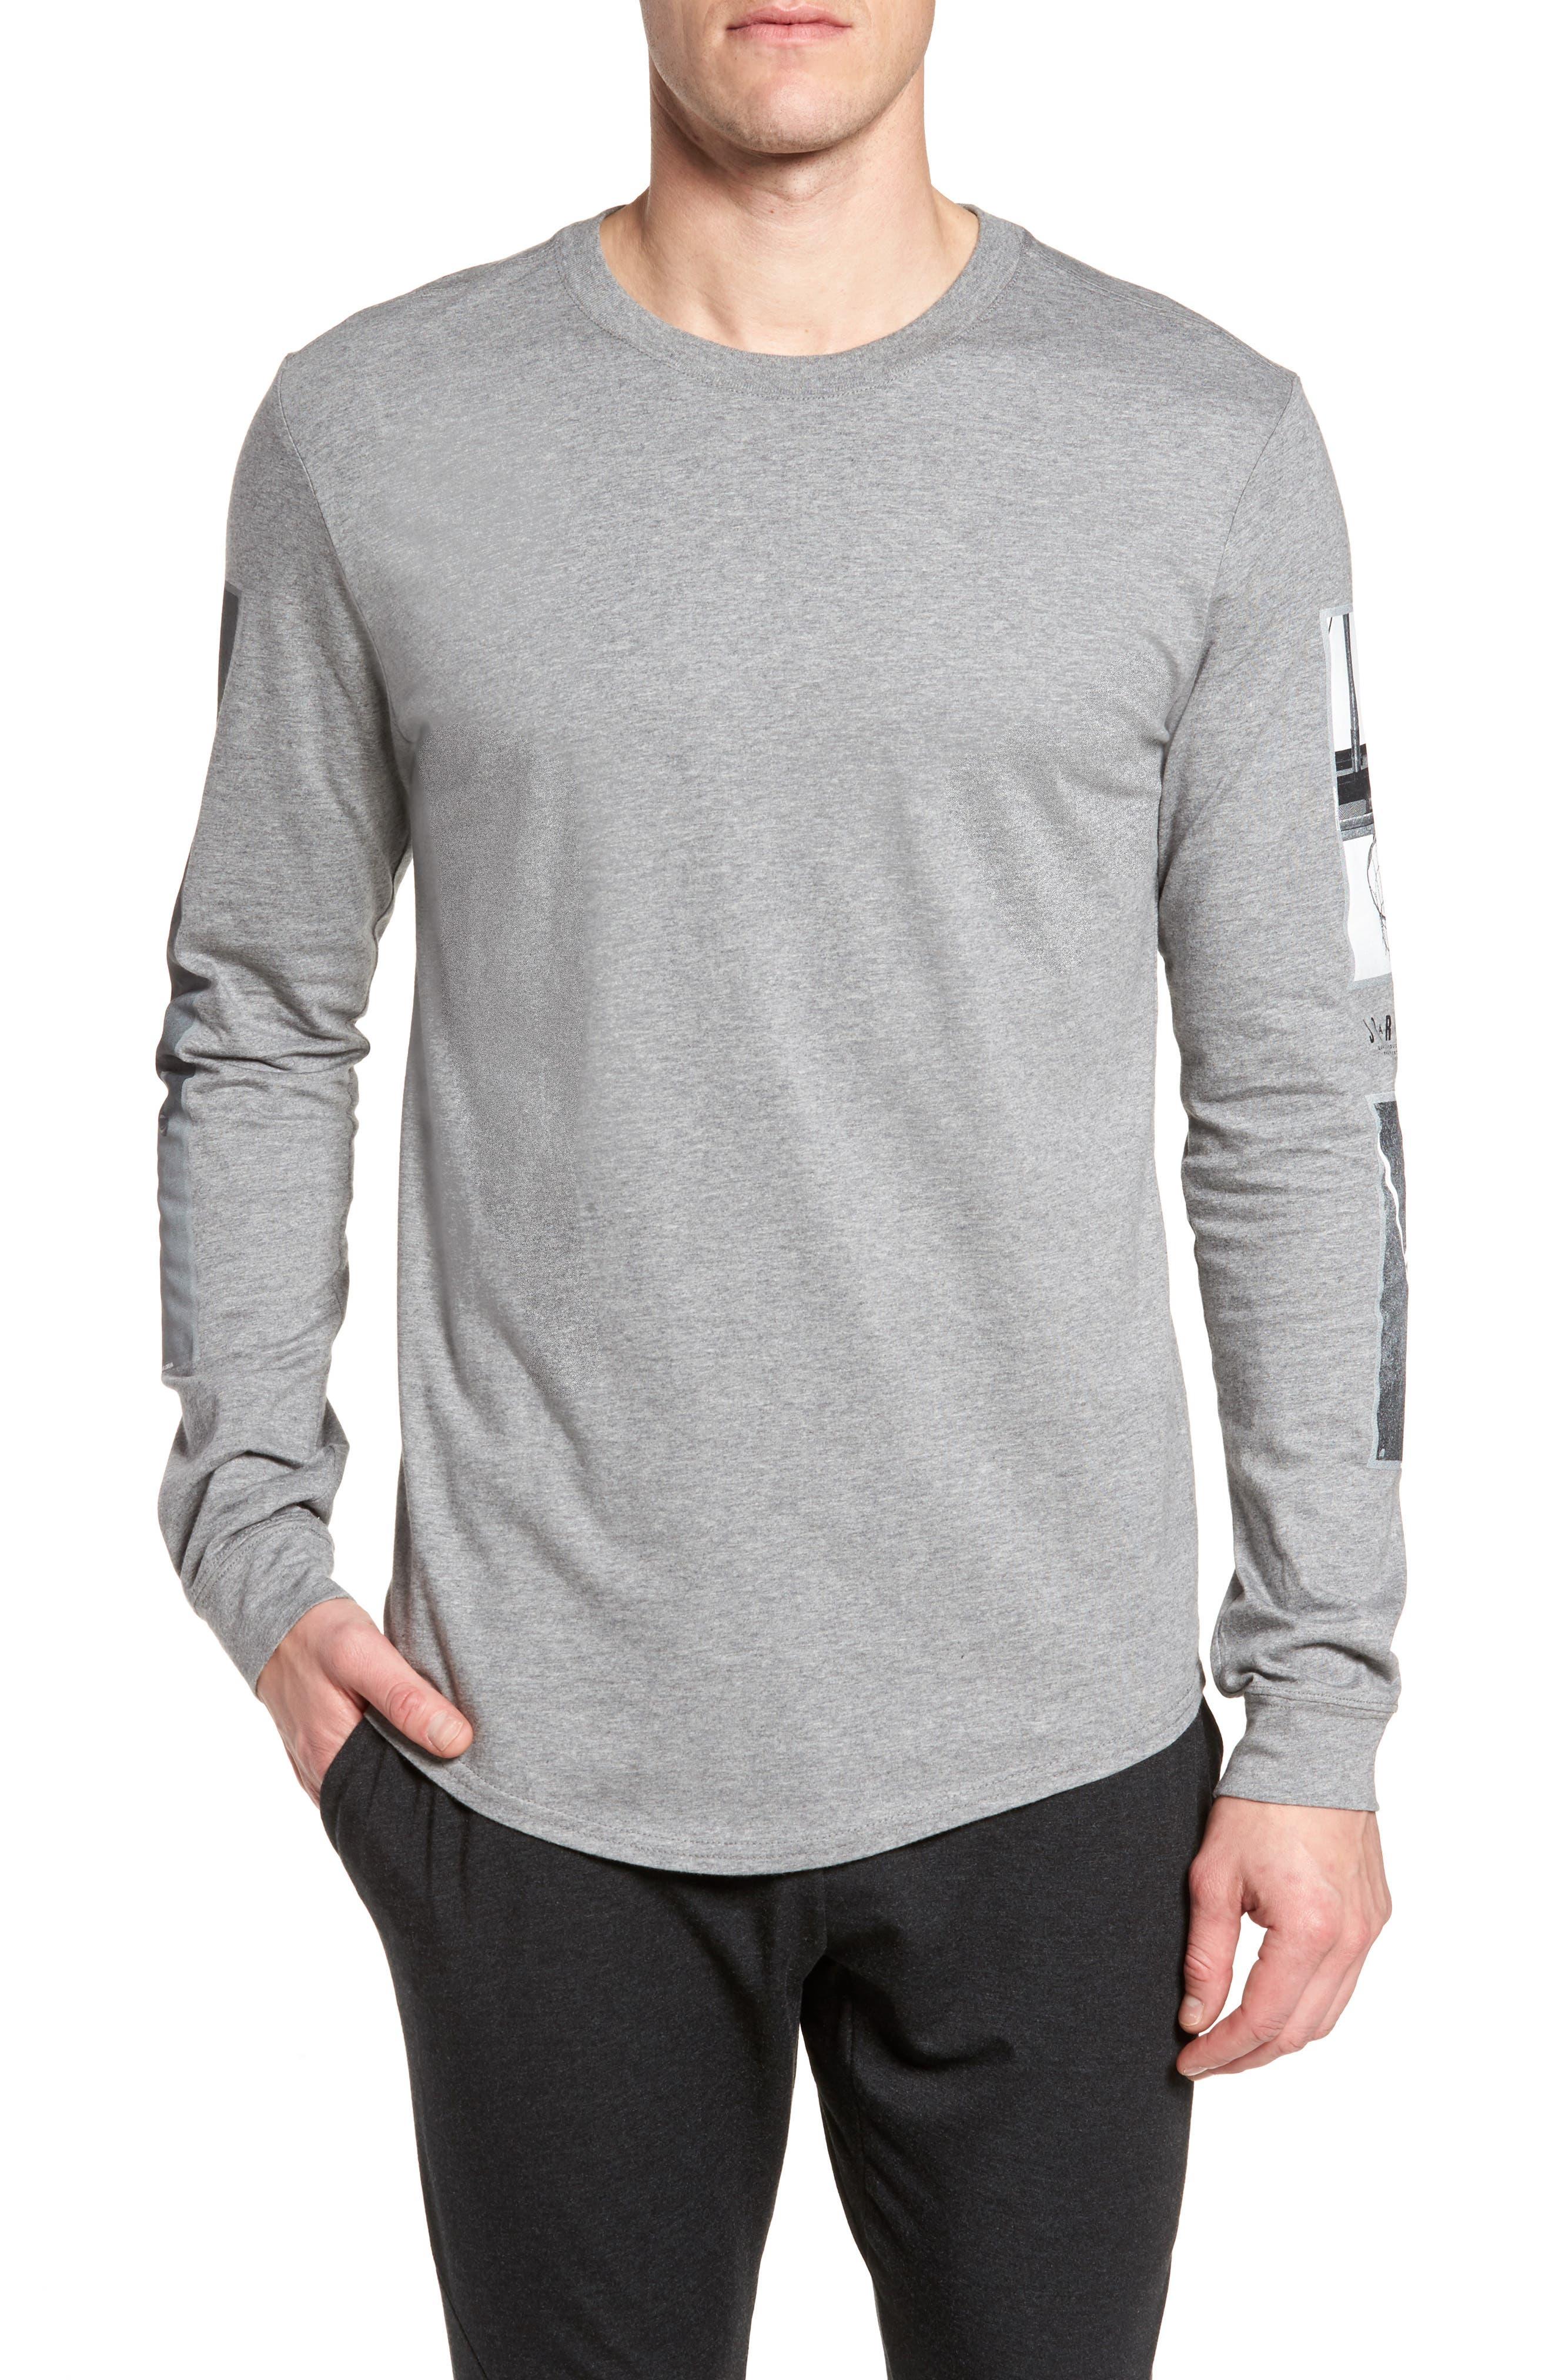 Alternate Image 1 Selected - Nike Jordan Sportswear Photo Sleeve T-Shirt